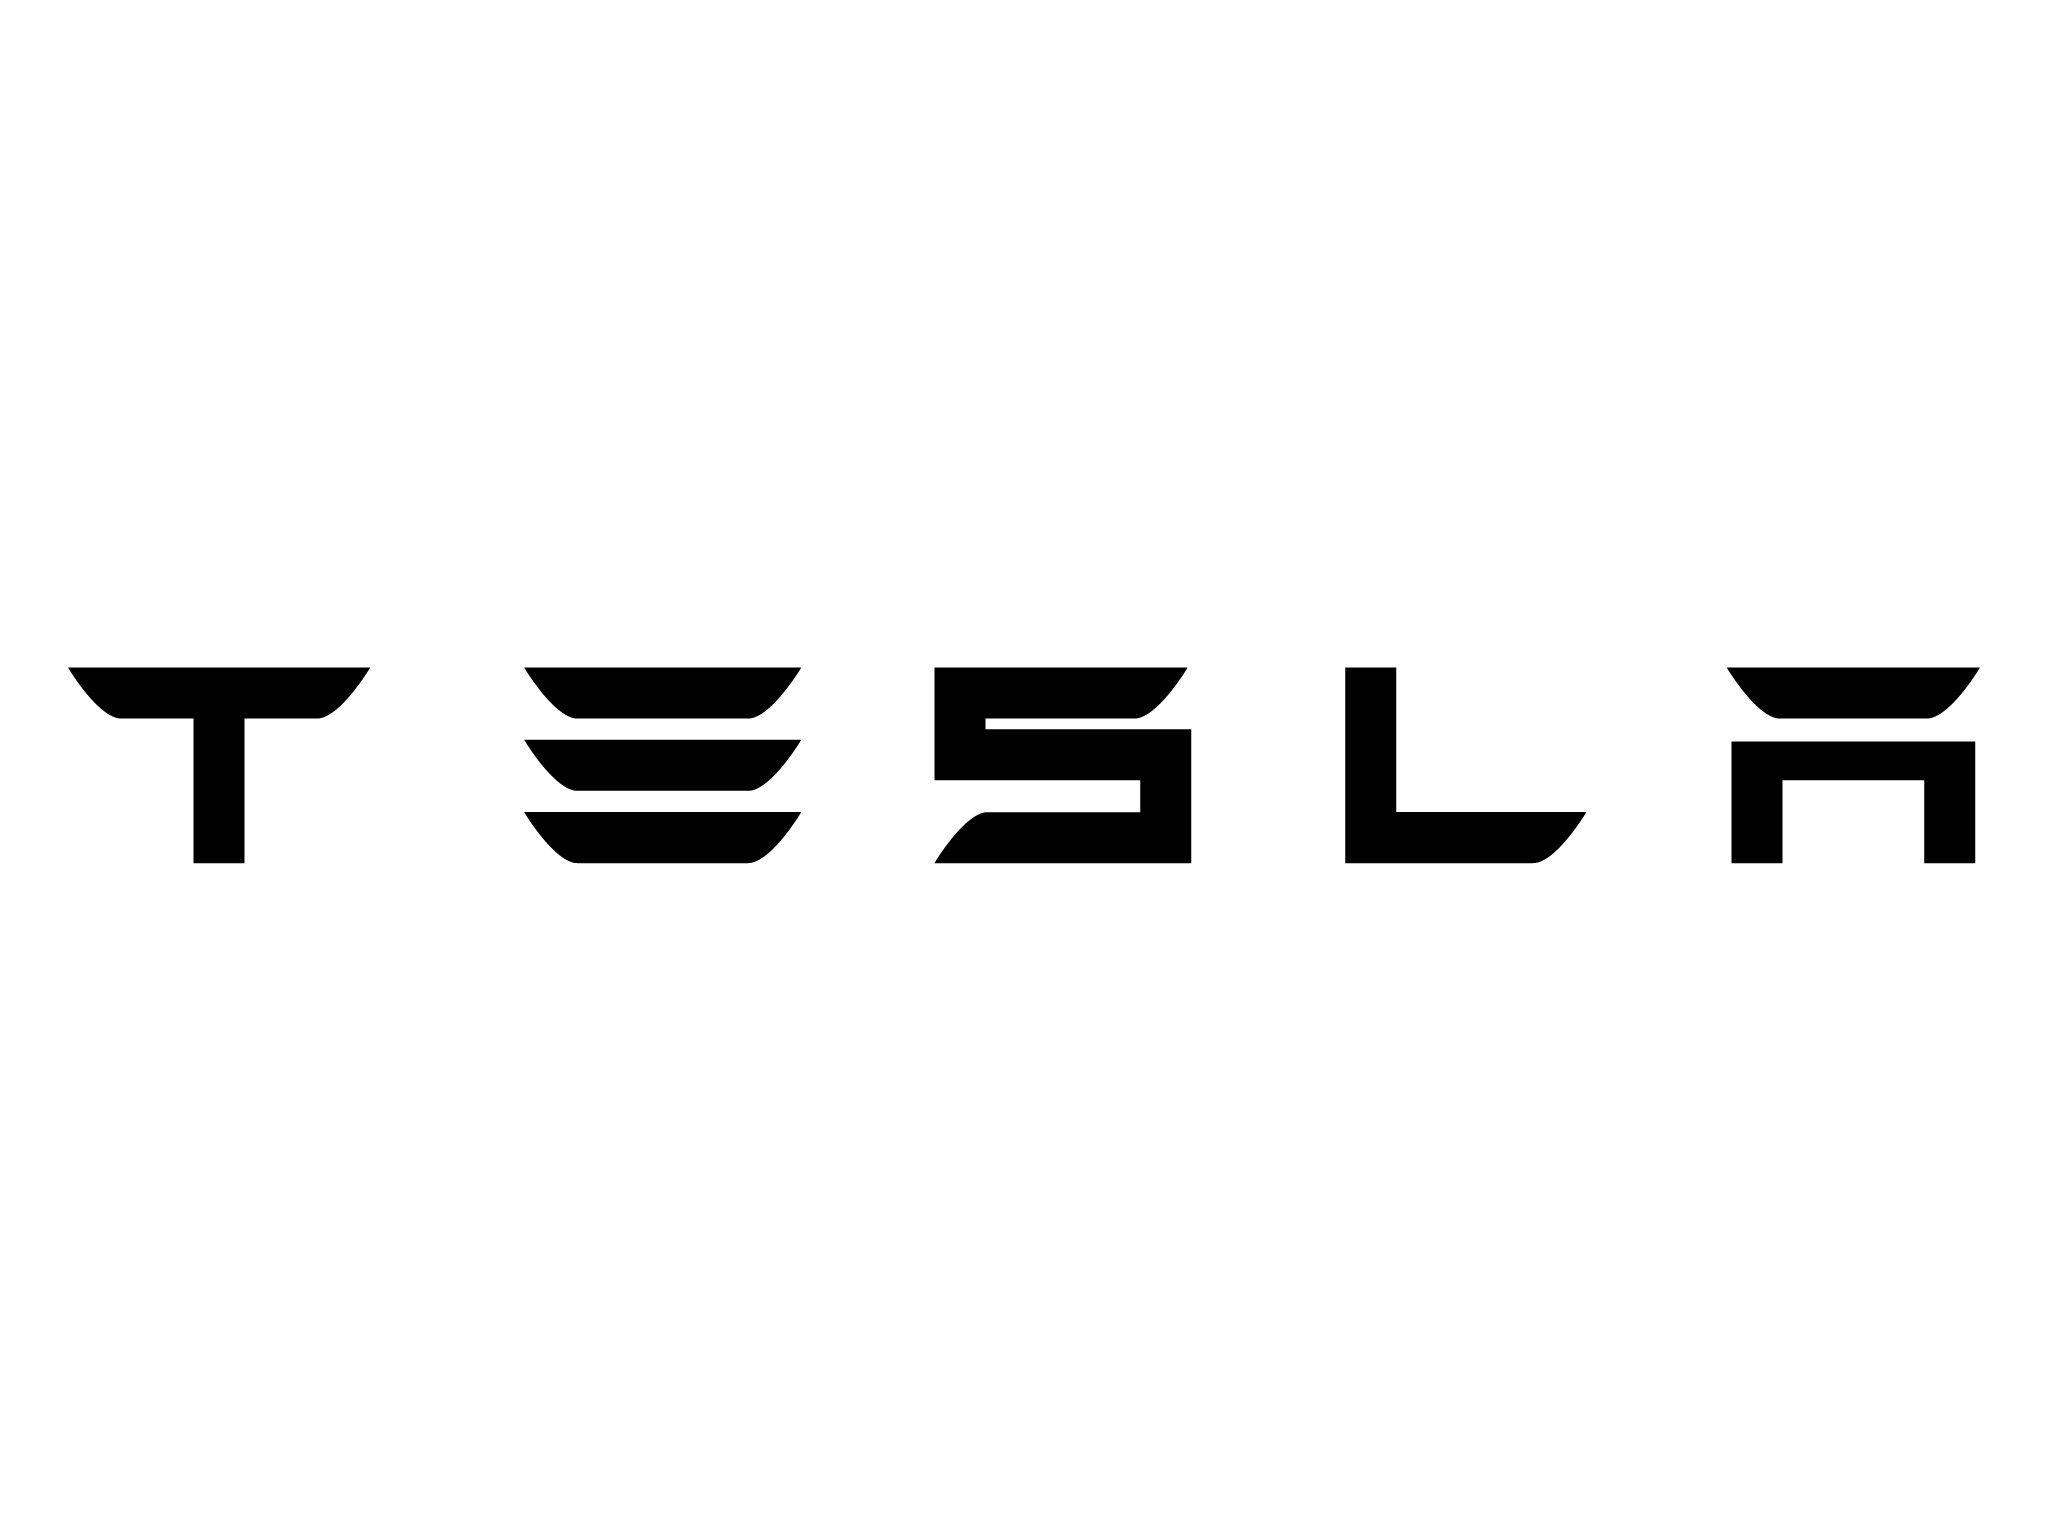 Tesla Motors, Inc.'s logo